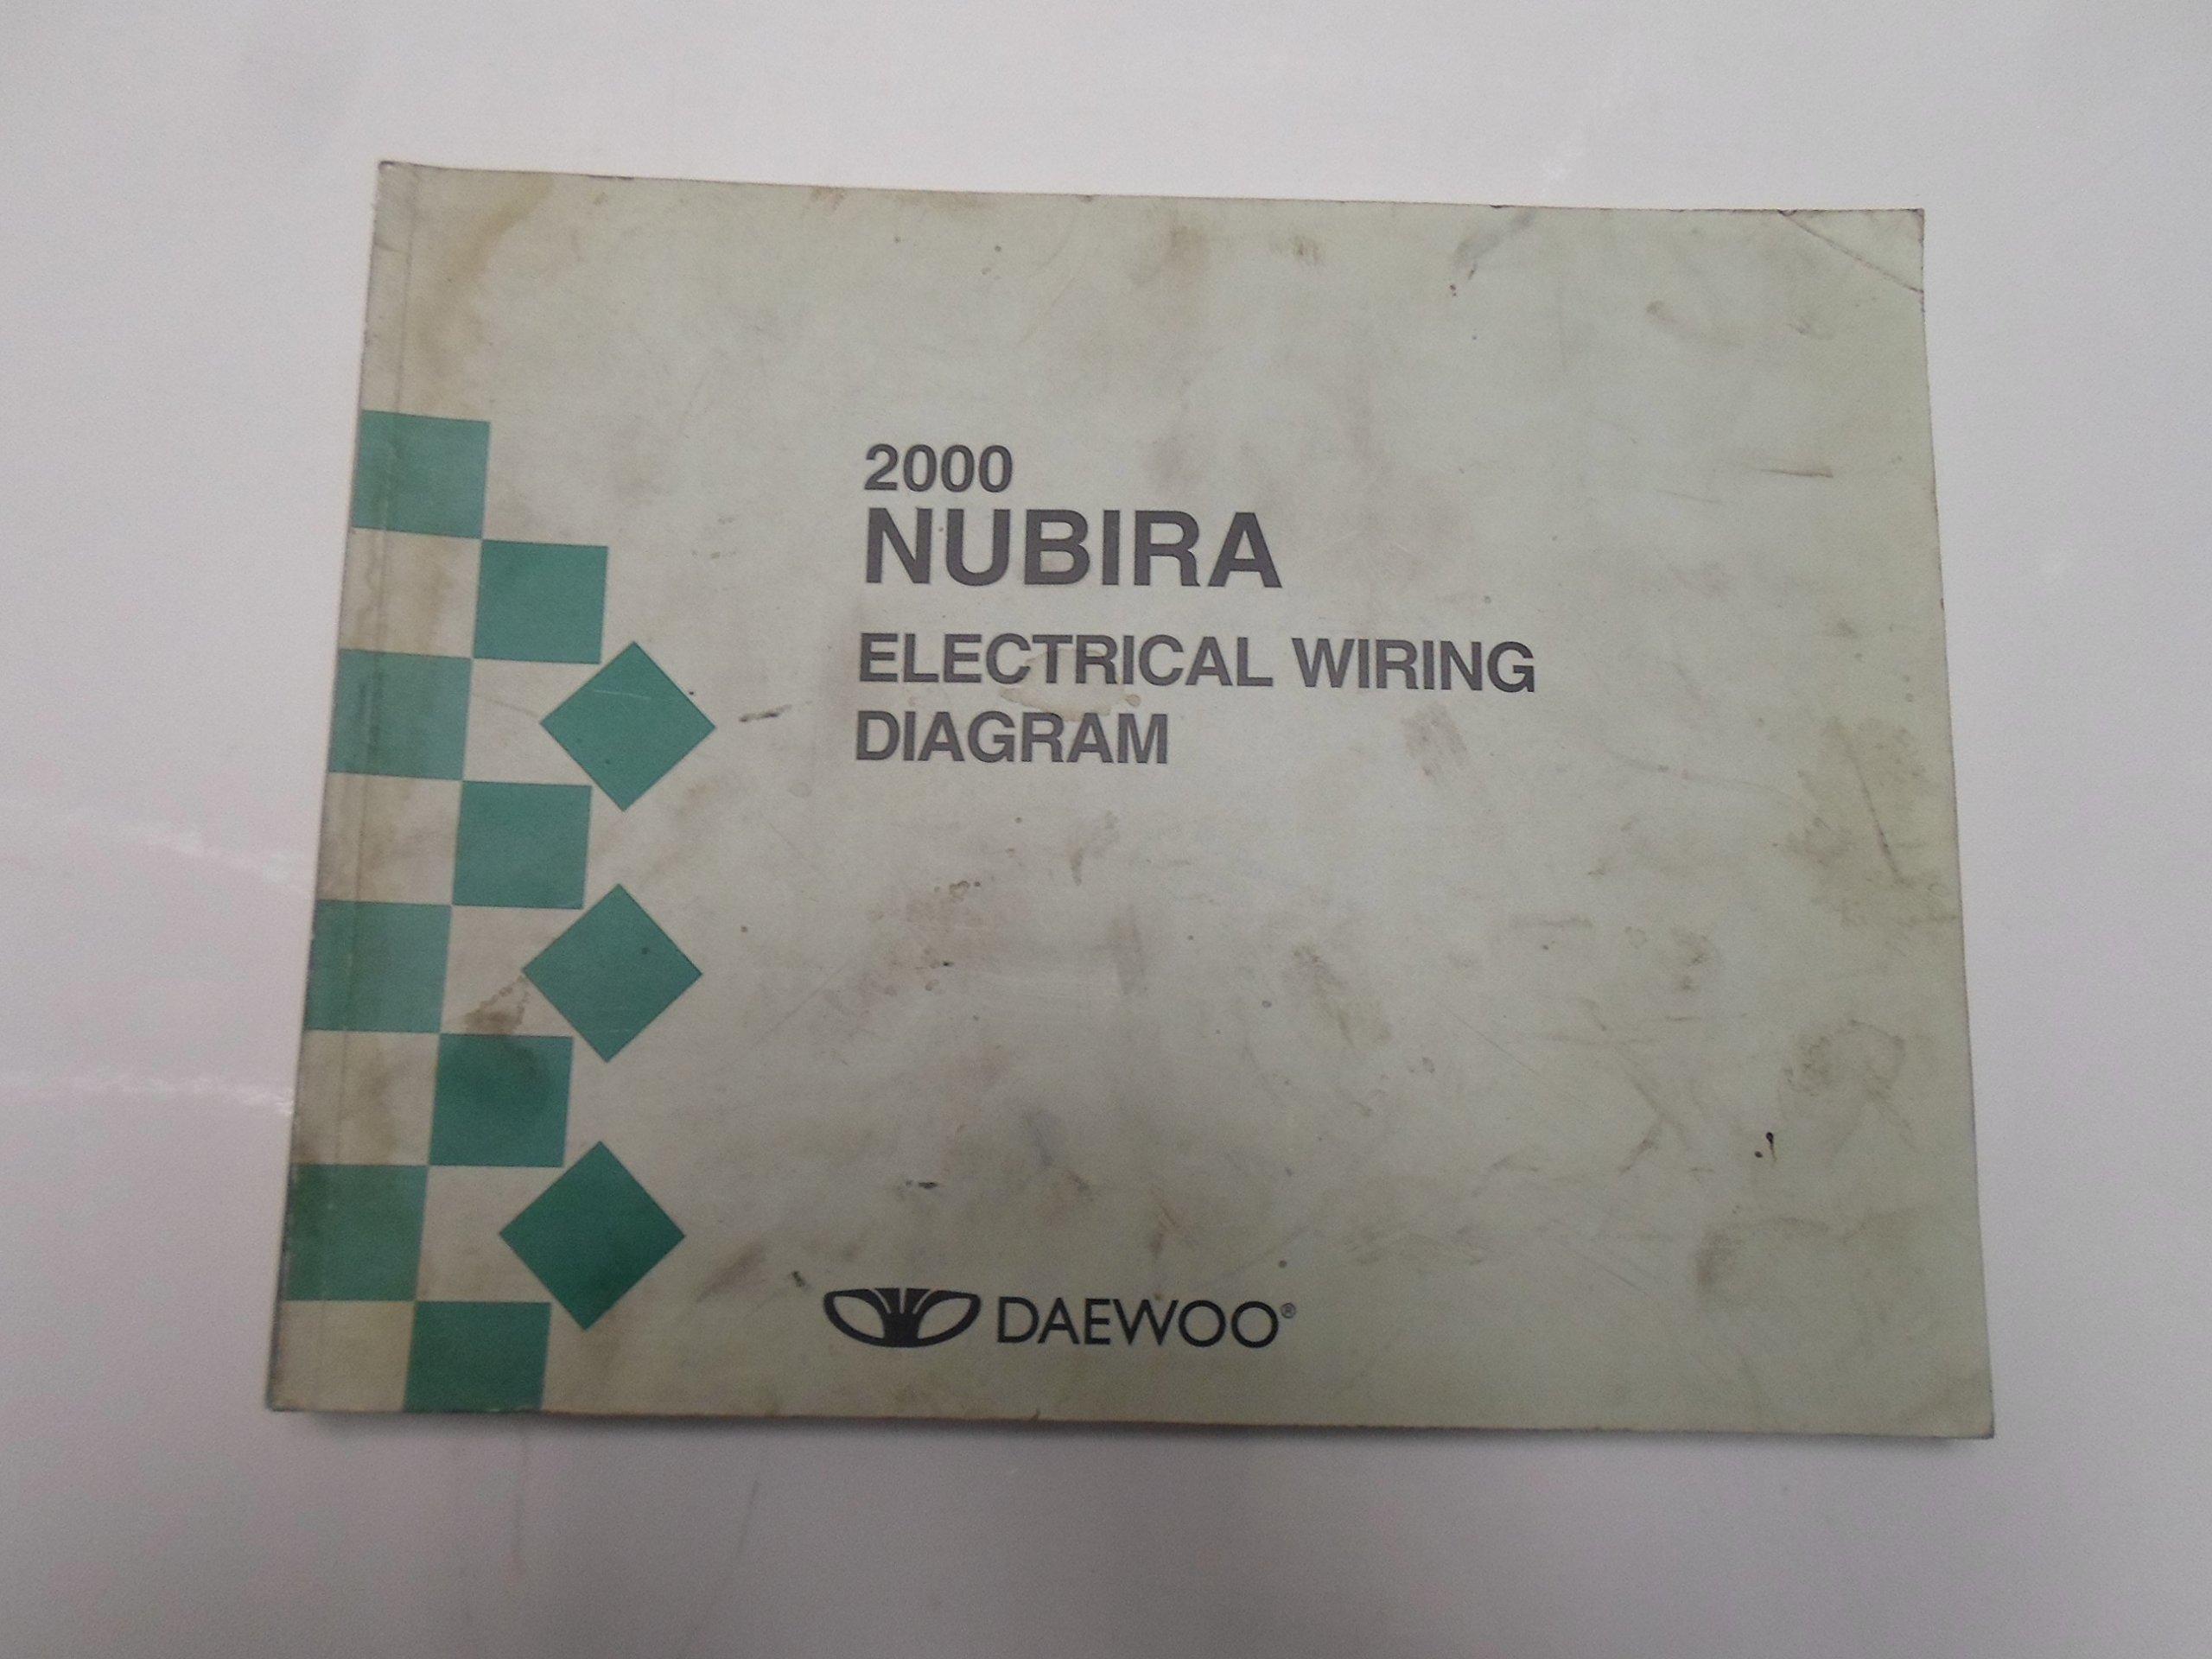 Wiring Diagram For Daewoo Nubira